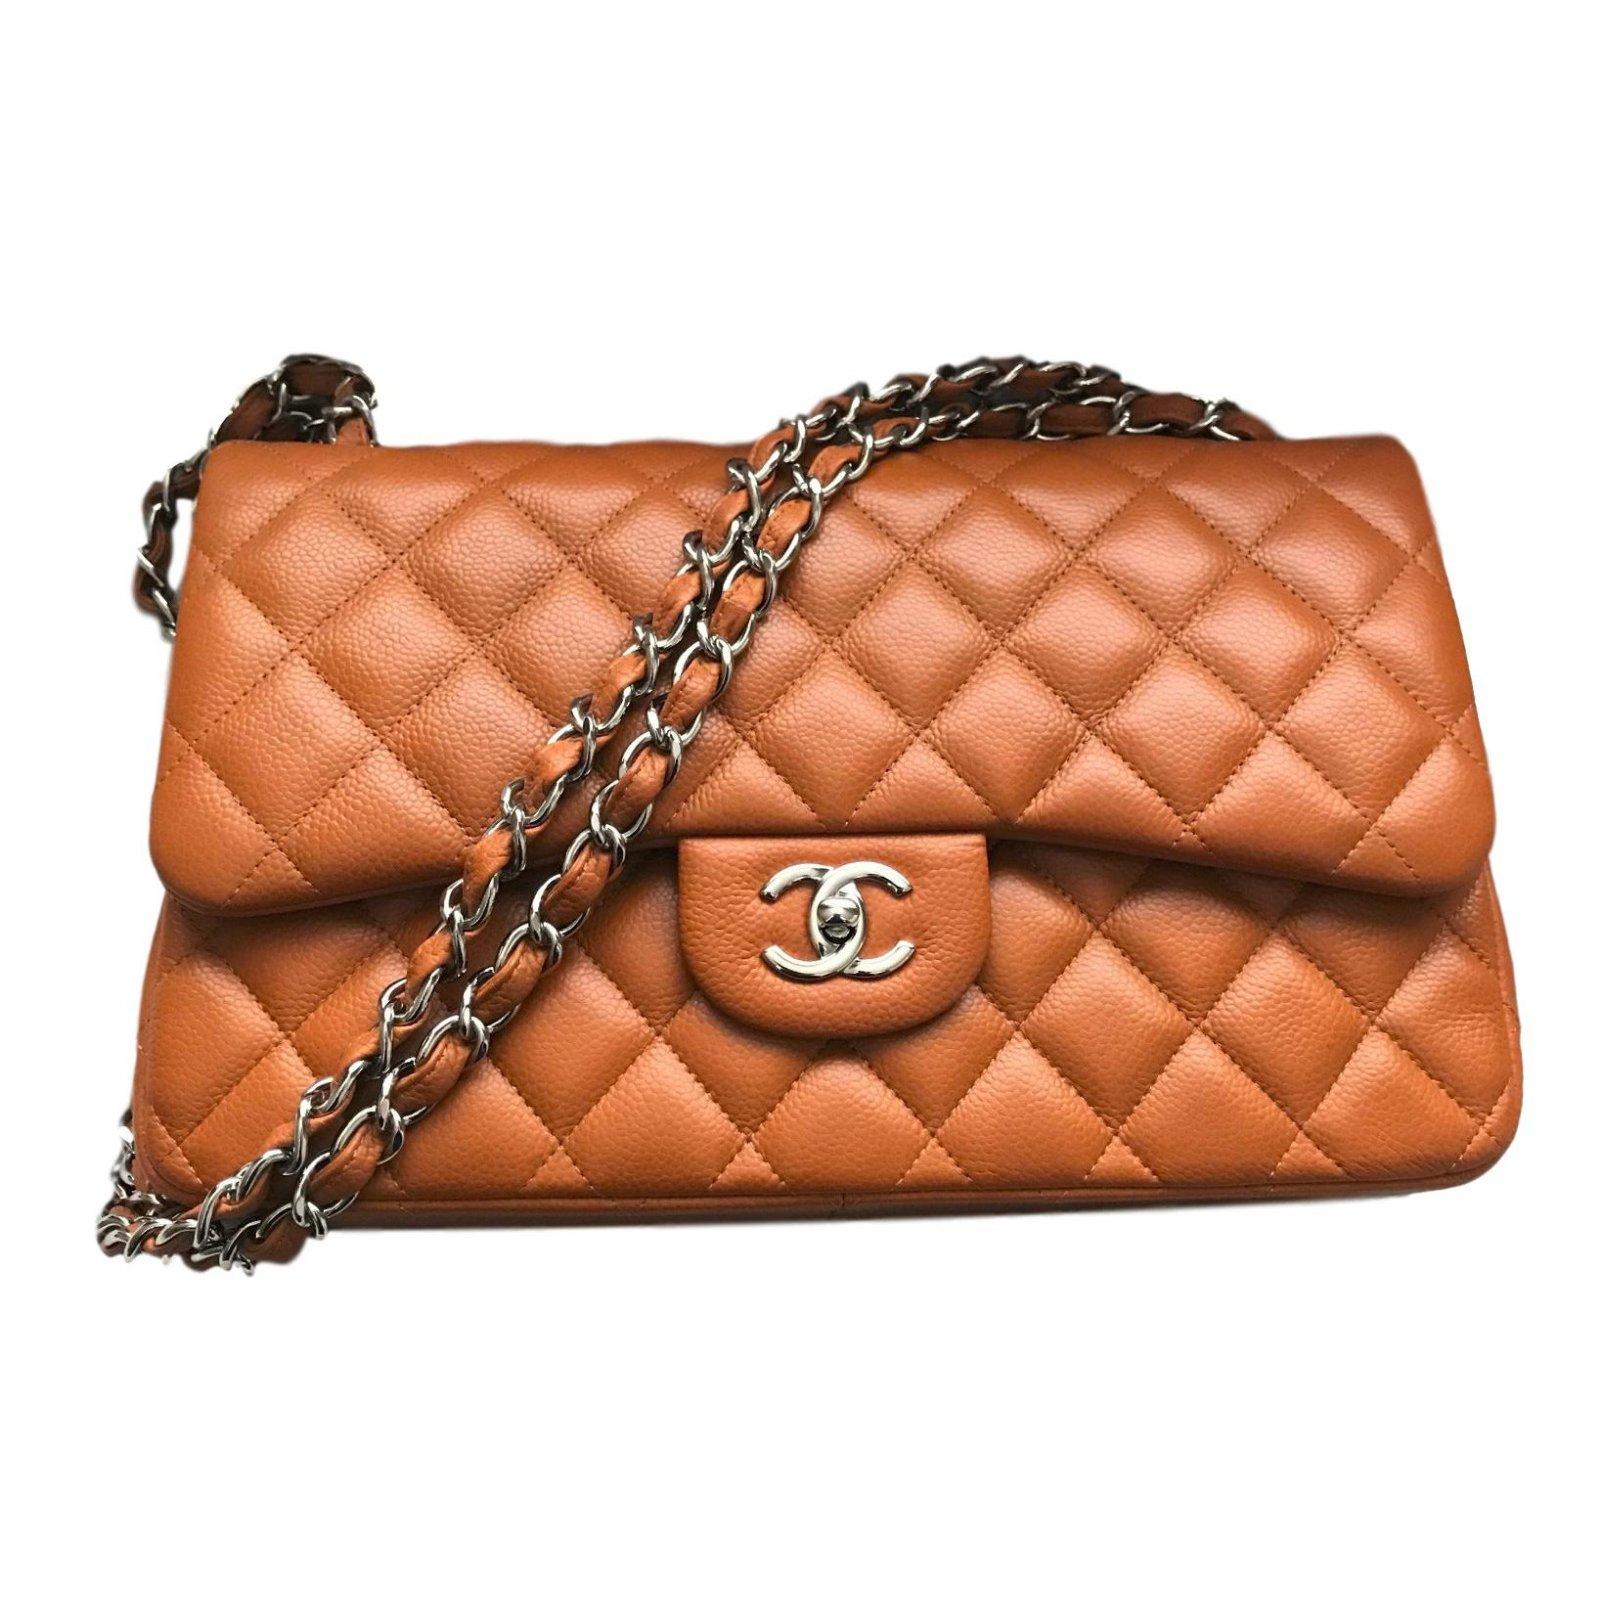 e72346d7978b Chanel Chanel Jumbo Timeless Classic lined Flap Bag - Caviar leather - Rich Caramel  Handbags Leather